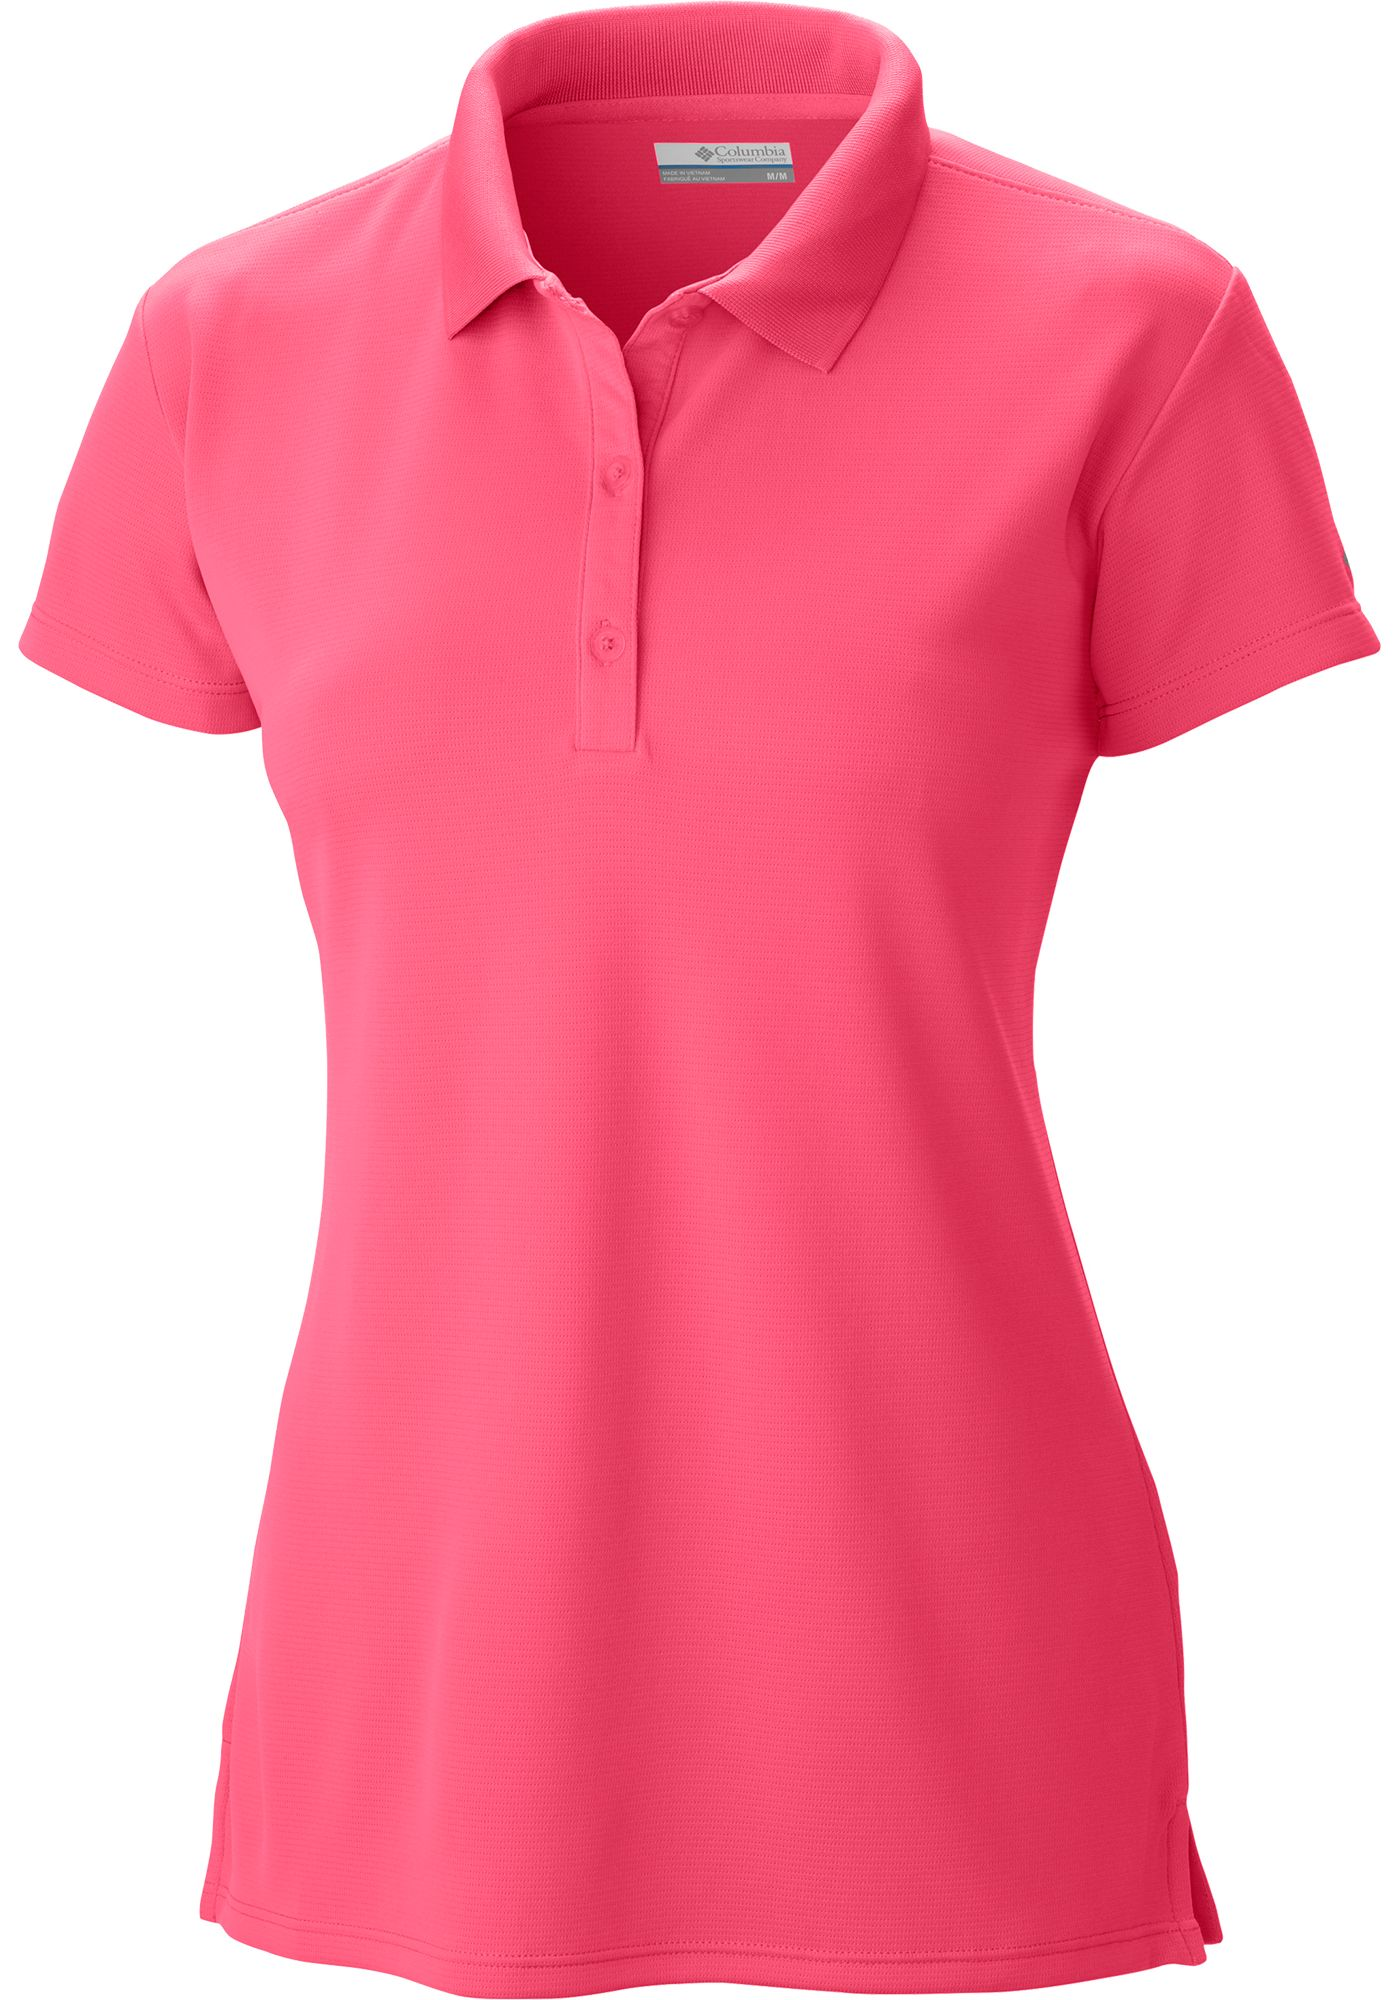 Columbia Women's Innisfree Polo Shirt